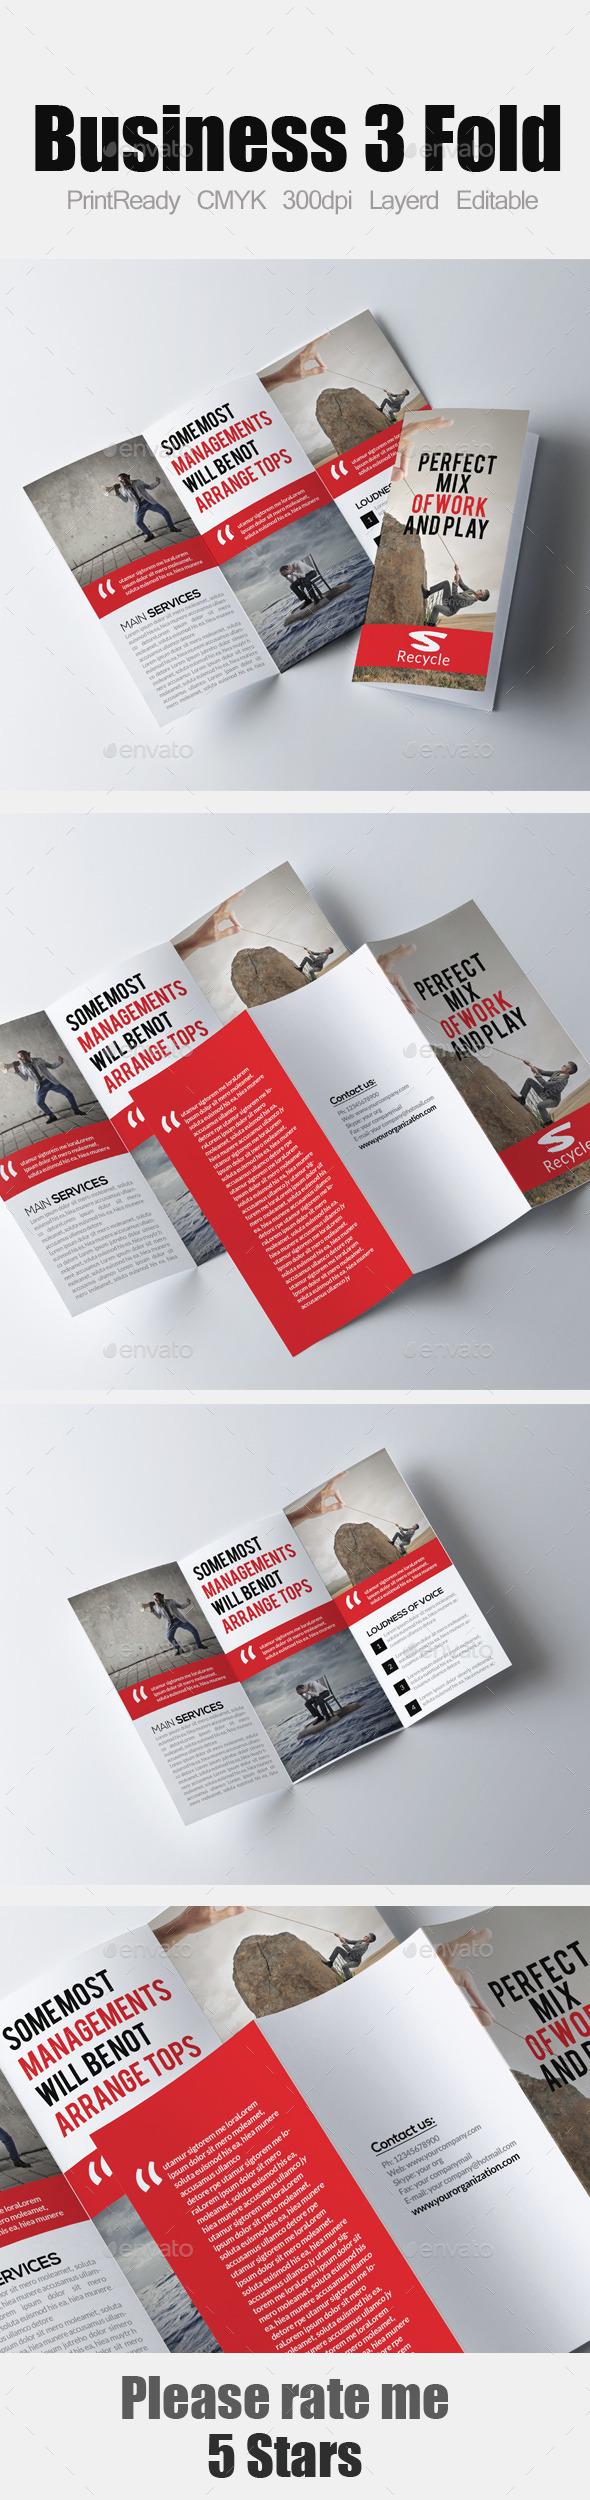 Z Fold Business Brochure   Folletos